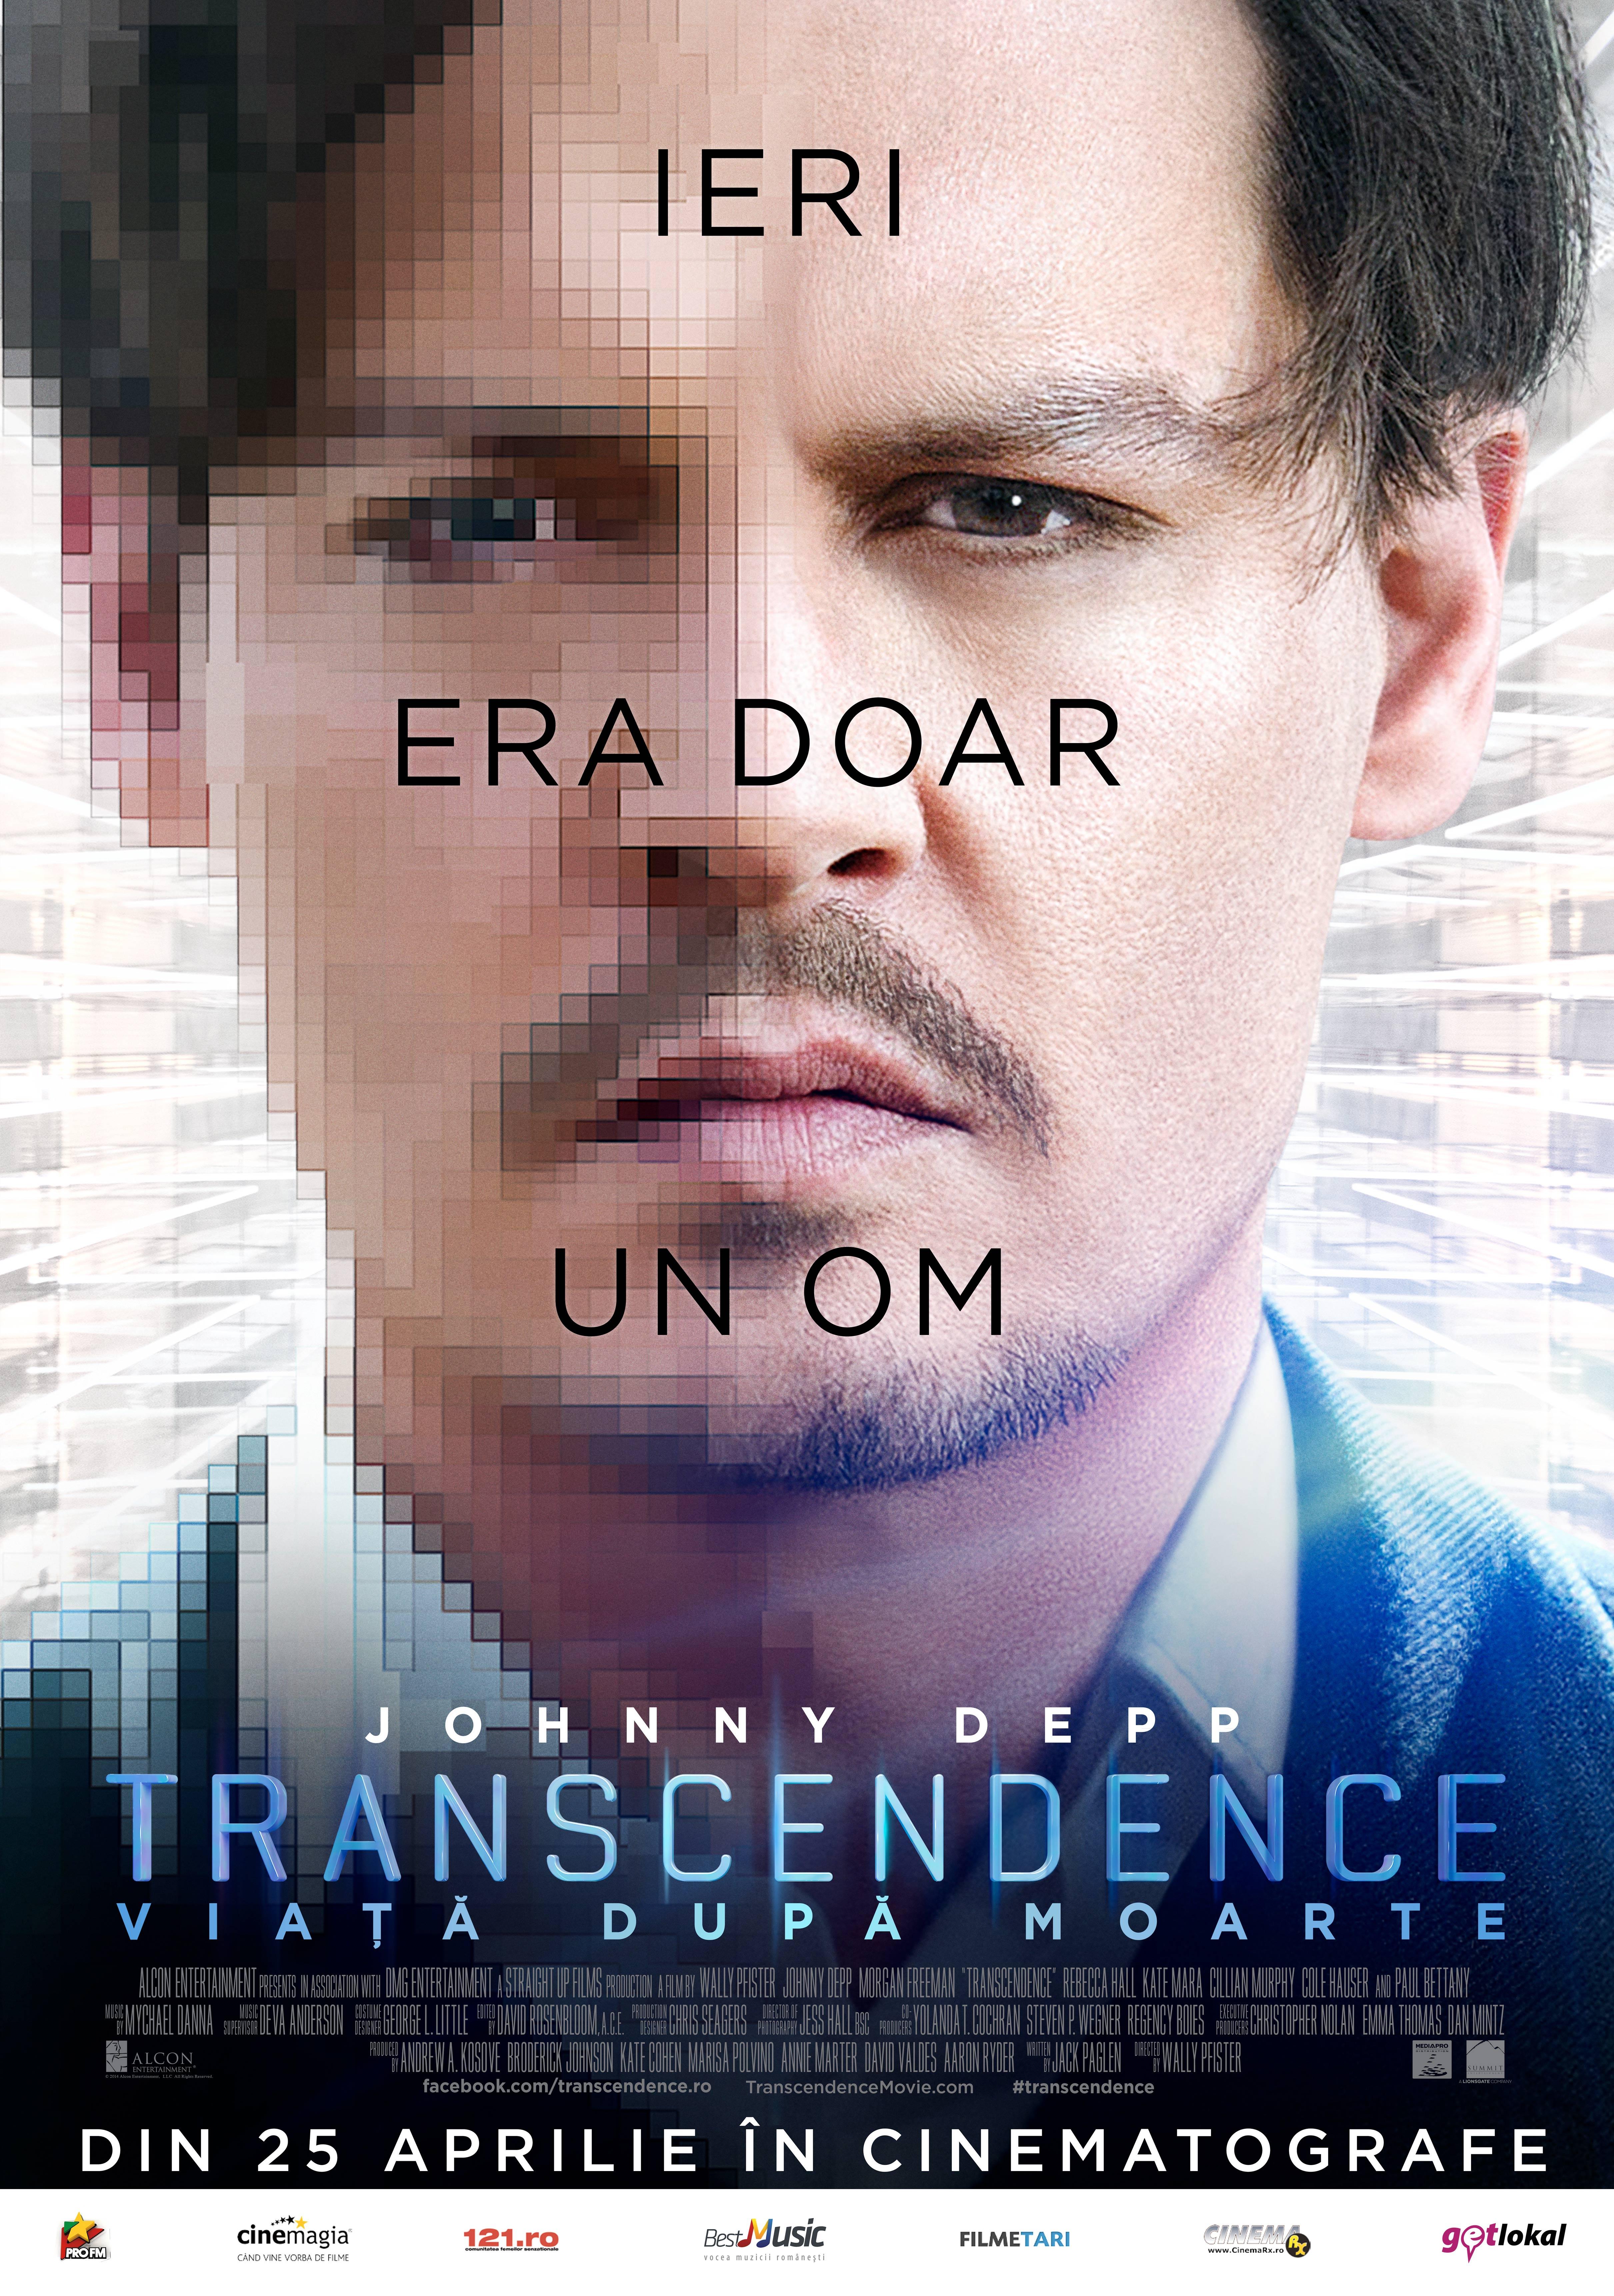 Transcendence: Viata dupa moarte